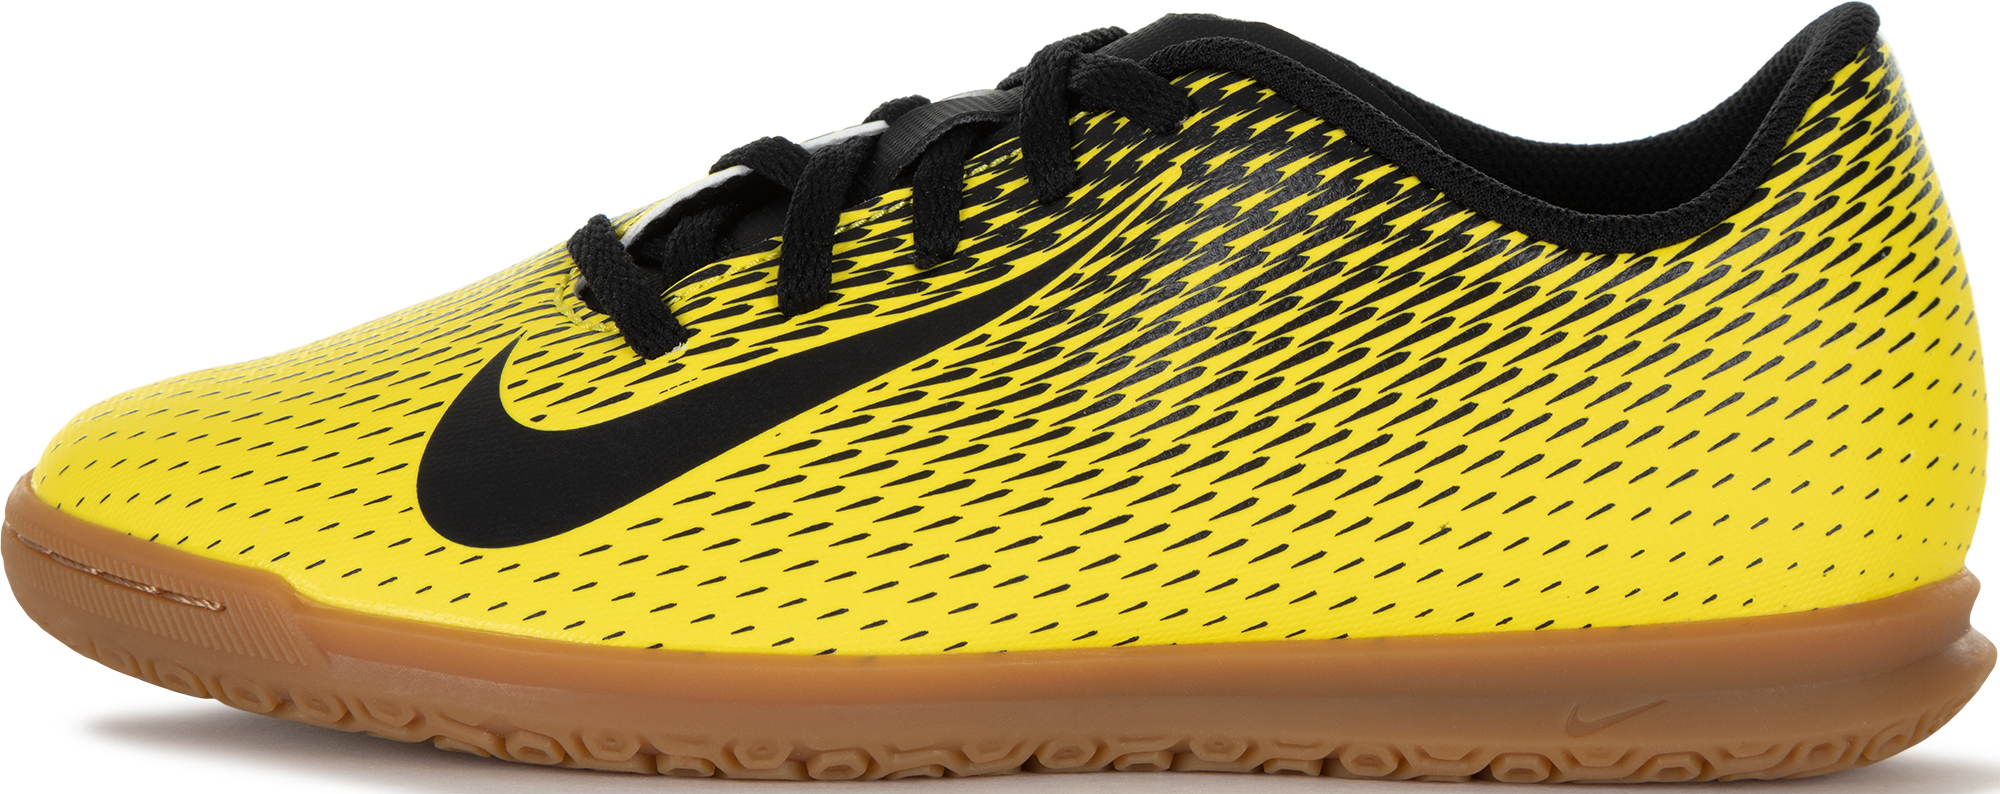 Nike Бутсы для мальчиков Nike Bravata II IC, размер 32,5